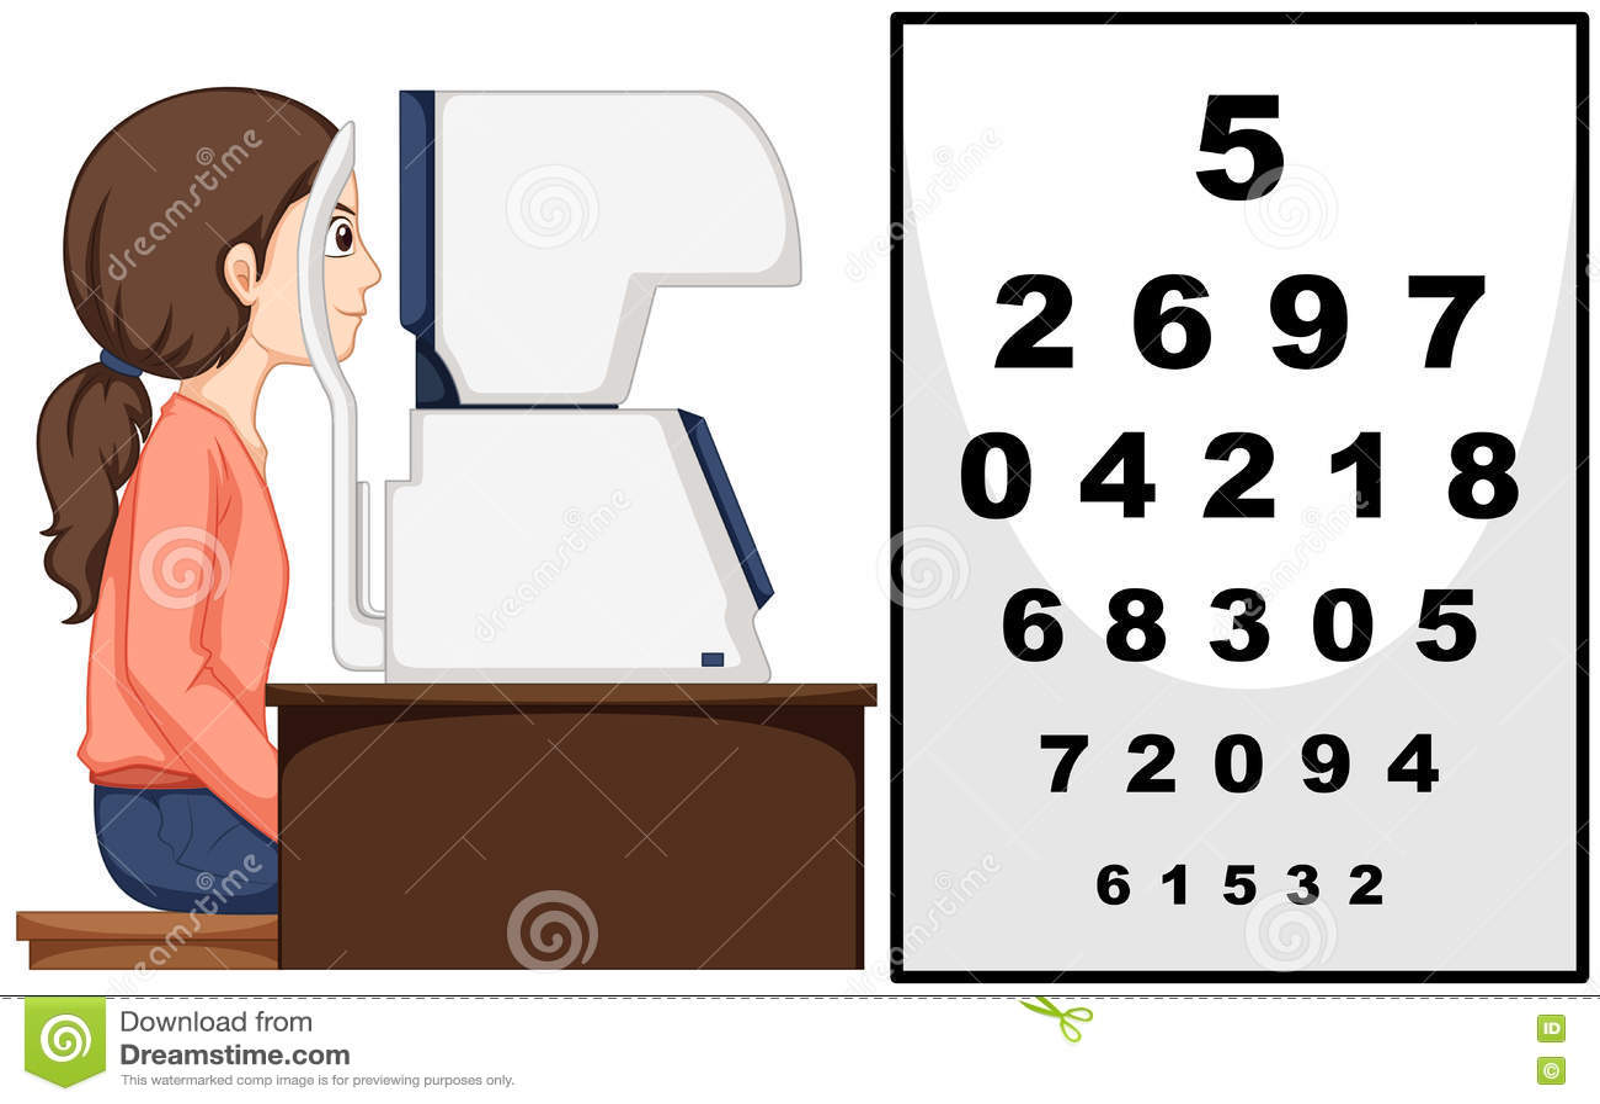 Woman having eyes exam with machine